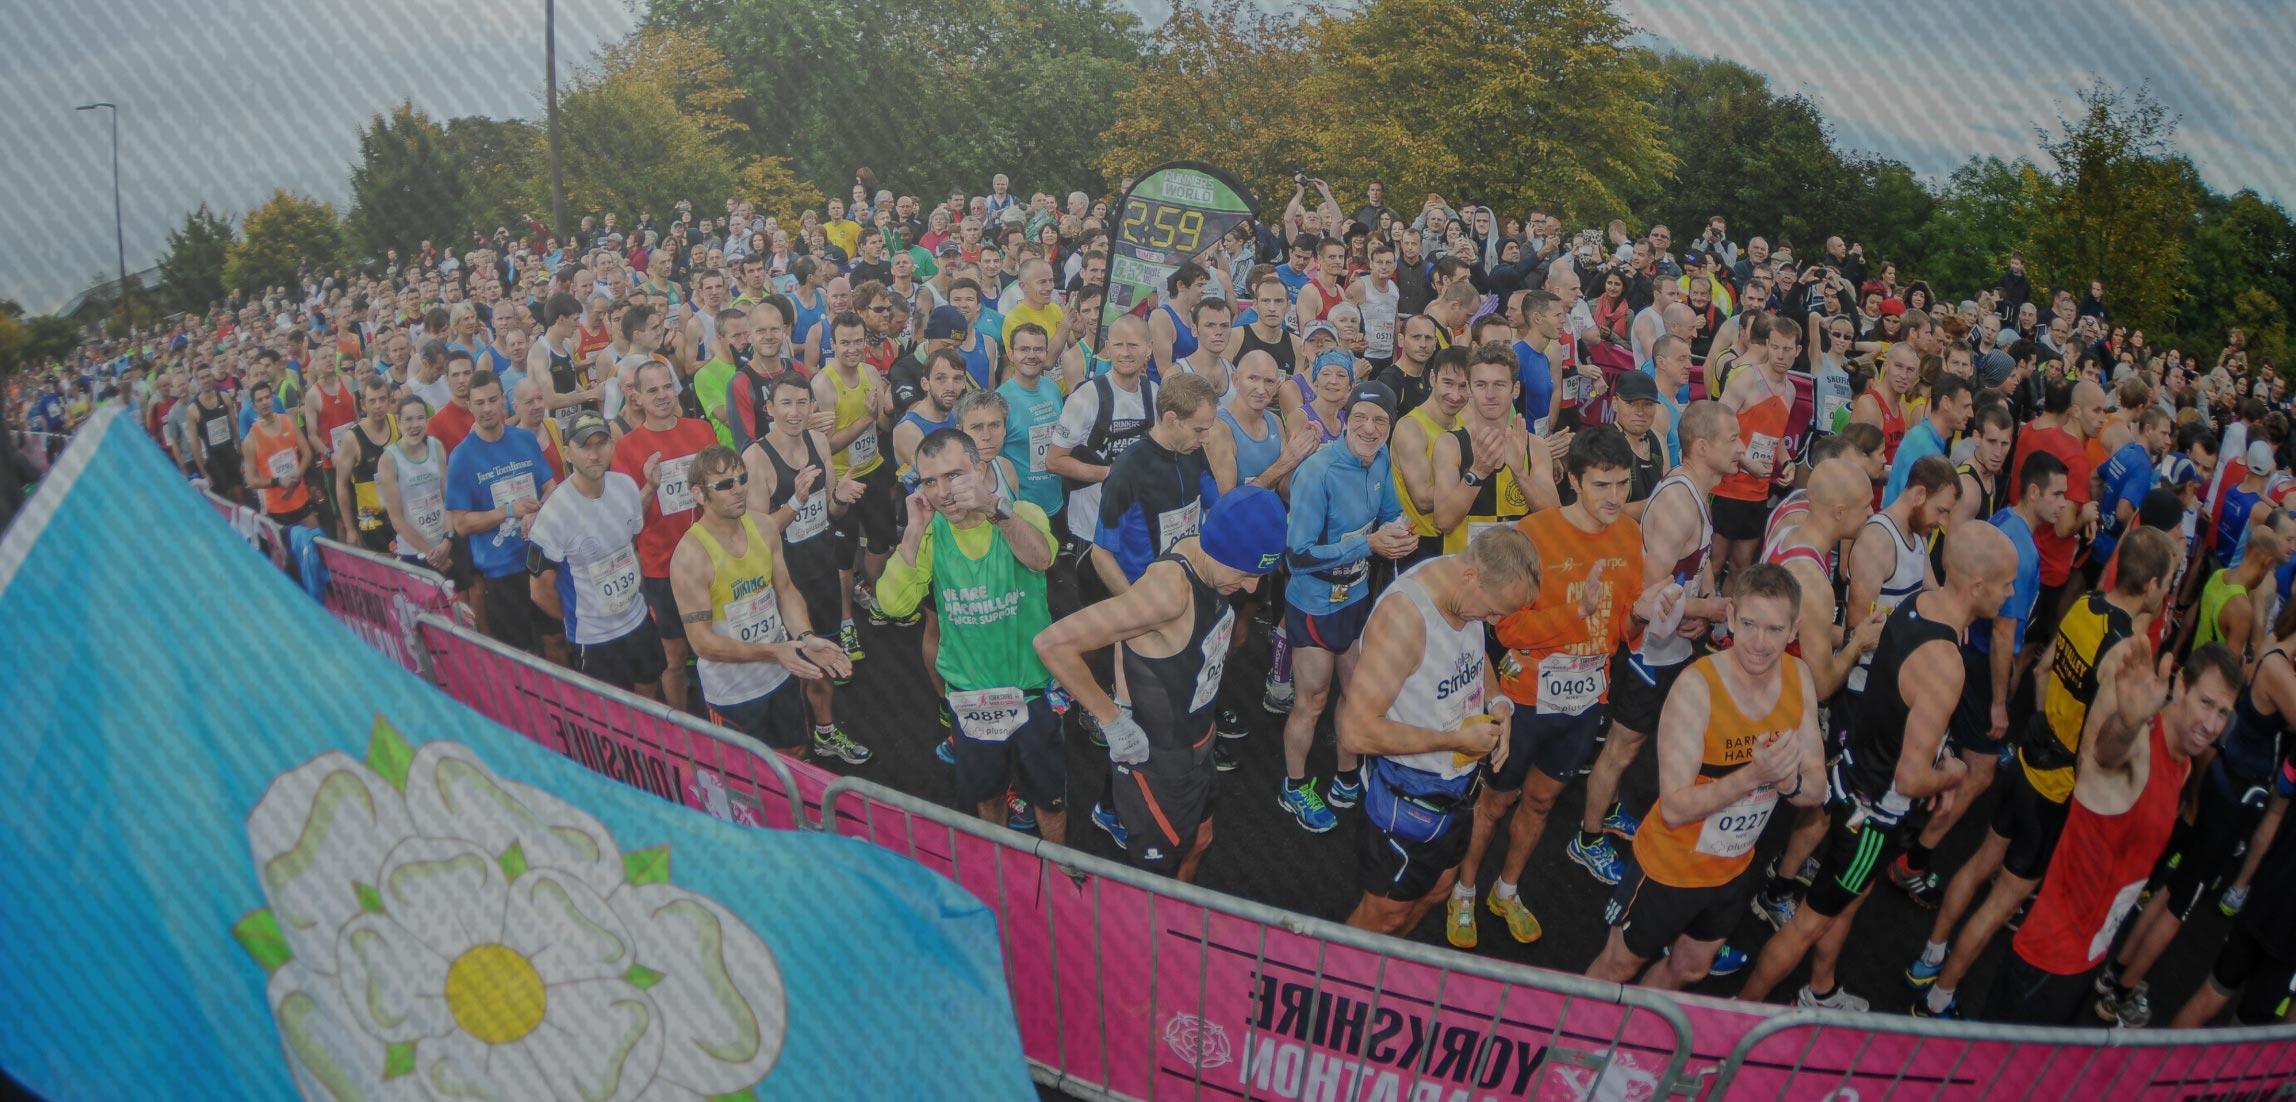 yorkshire-marathon-2018